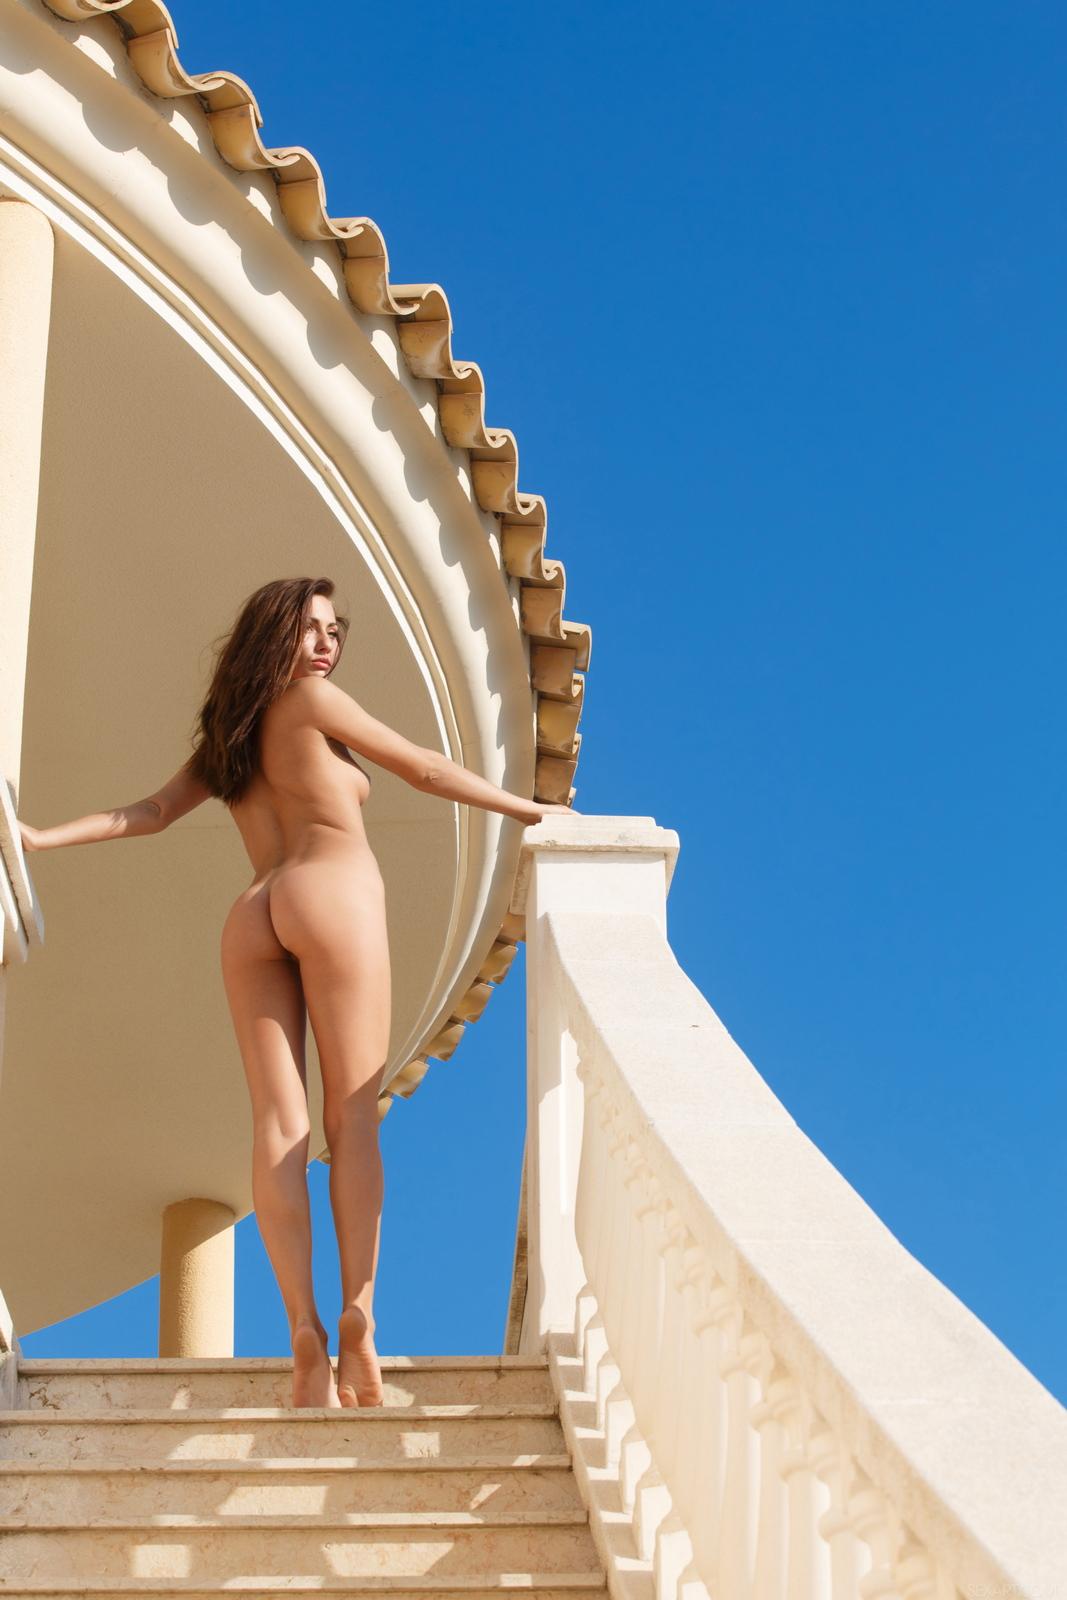 michaela-isizzu-stairs-high-heels-naked-sexart-44